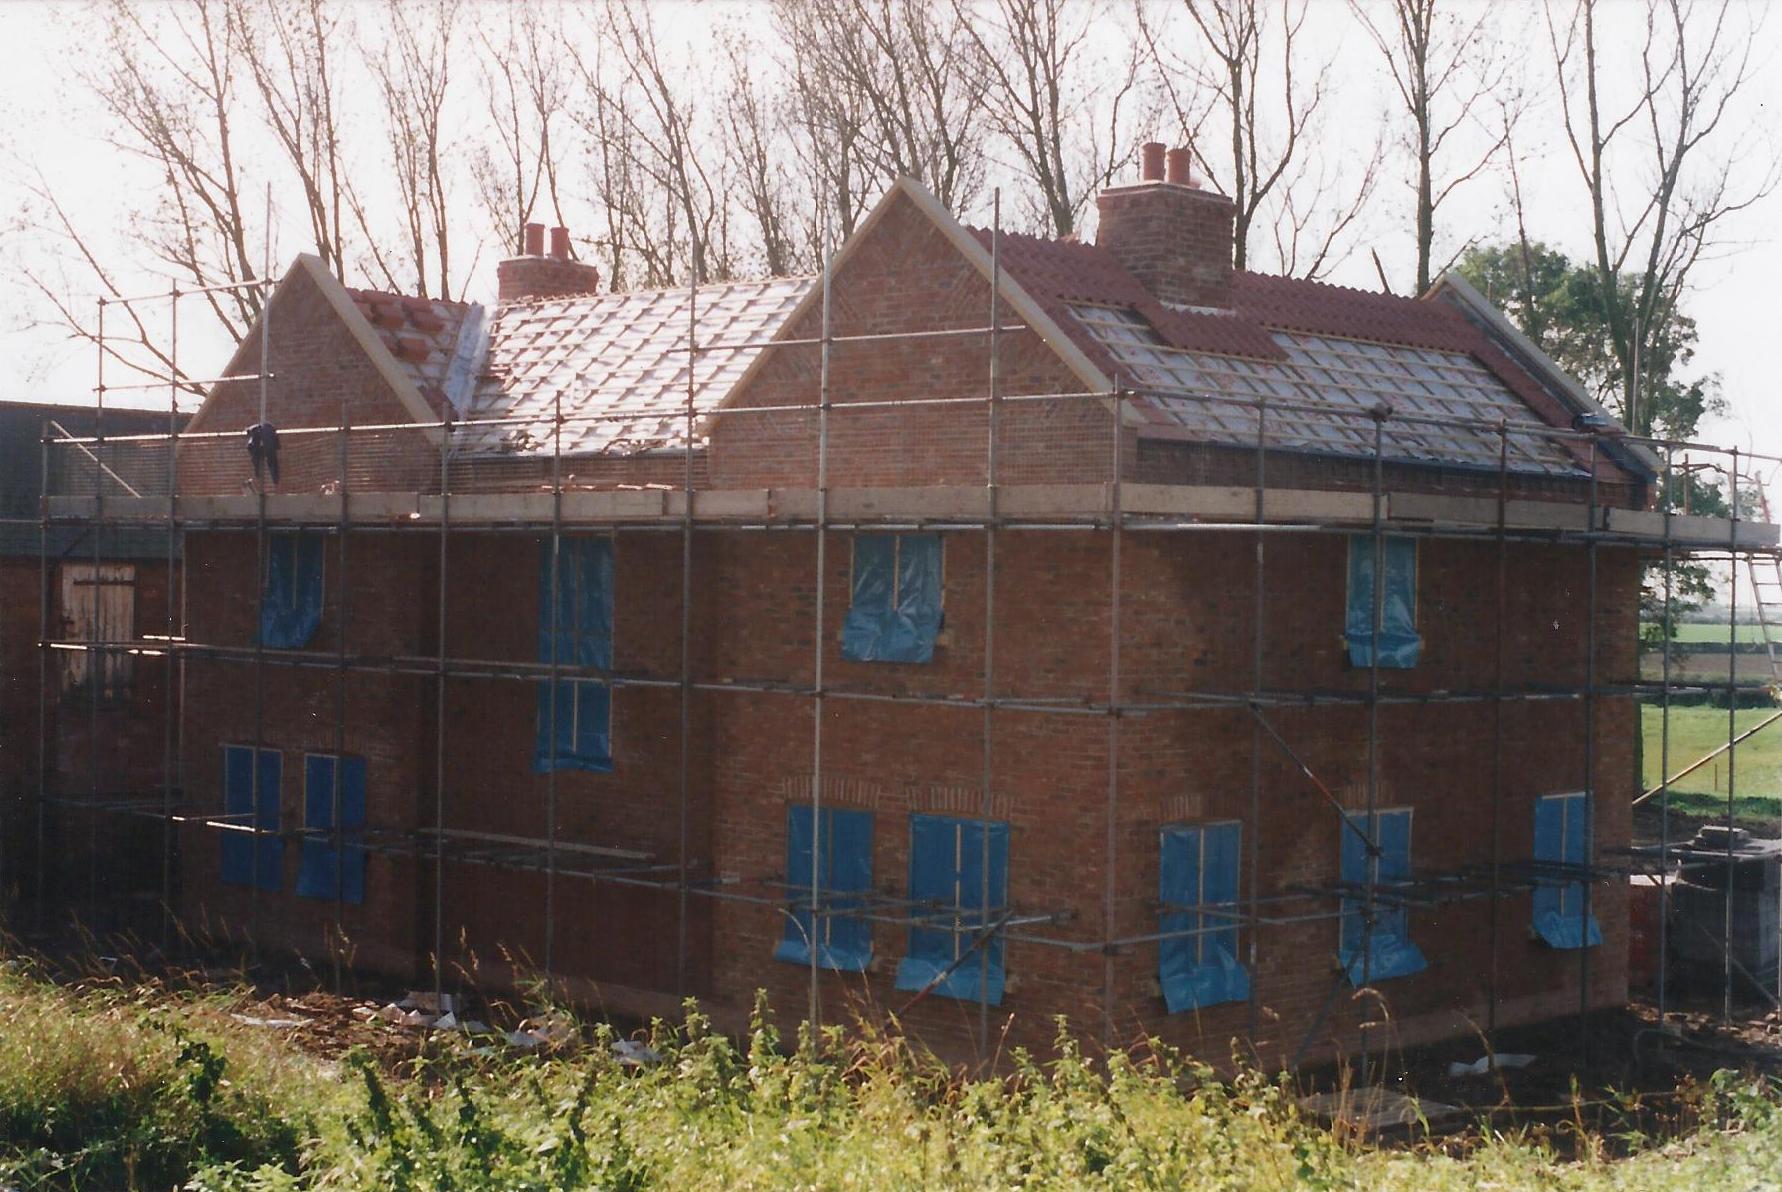 Construction Image 2 - North End Farm - East Yorkshire Architects - Samuel Kendall Associates